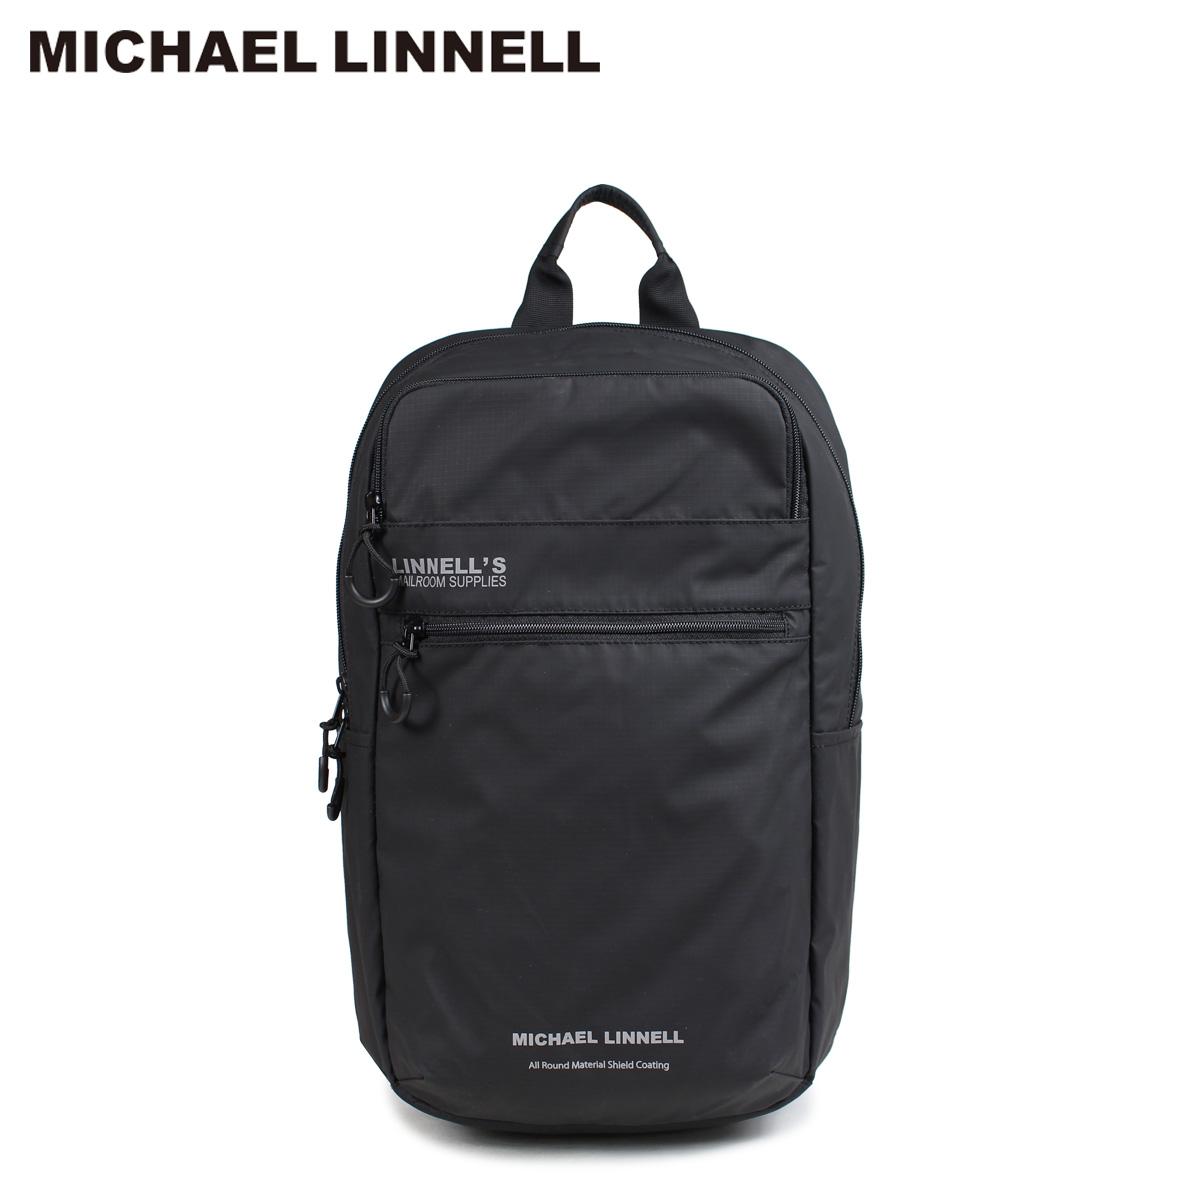 MICHAEL LINNELL マイケルリンネル リュック バッグ 23L メンズ レディース バックパック BACKPACK ブラック MLAC-05 [10/22 新入荷]